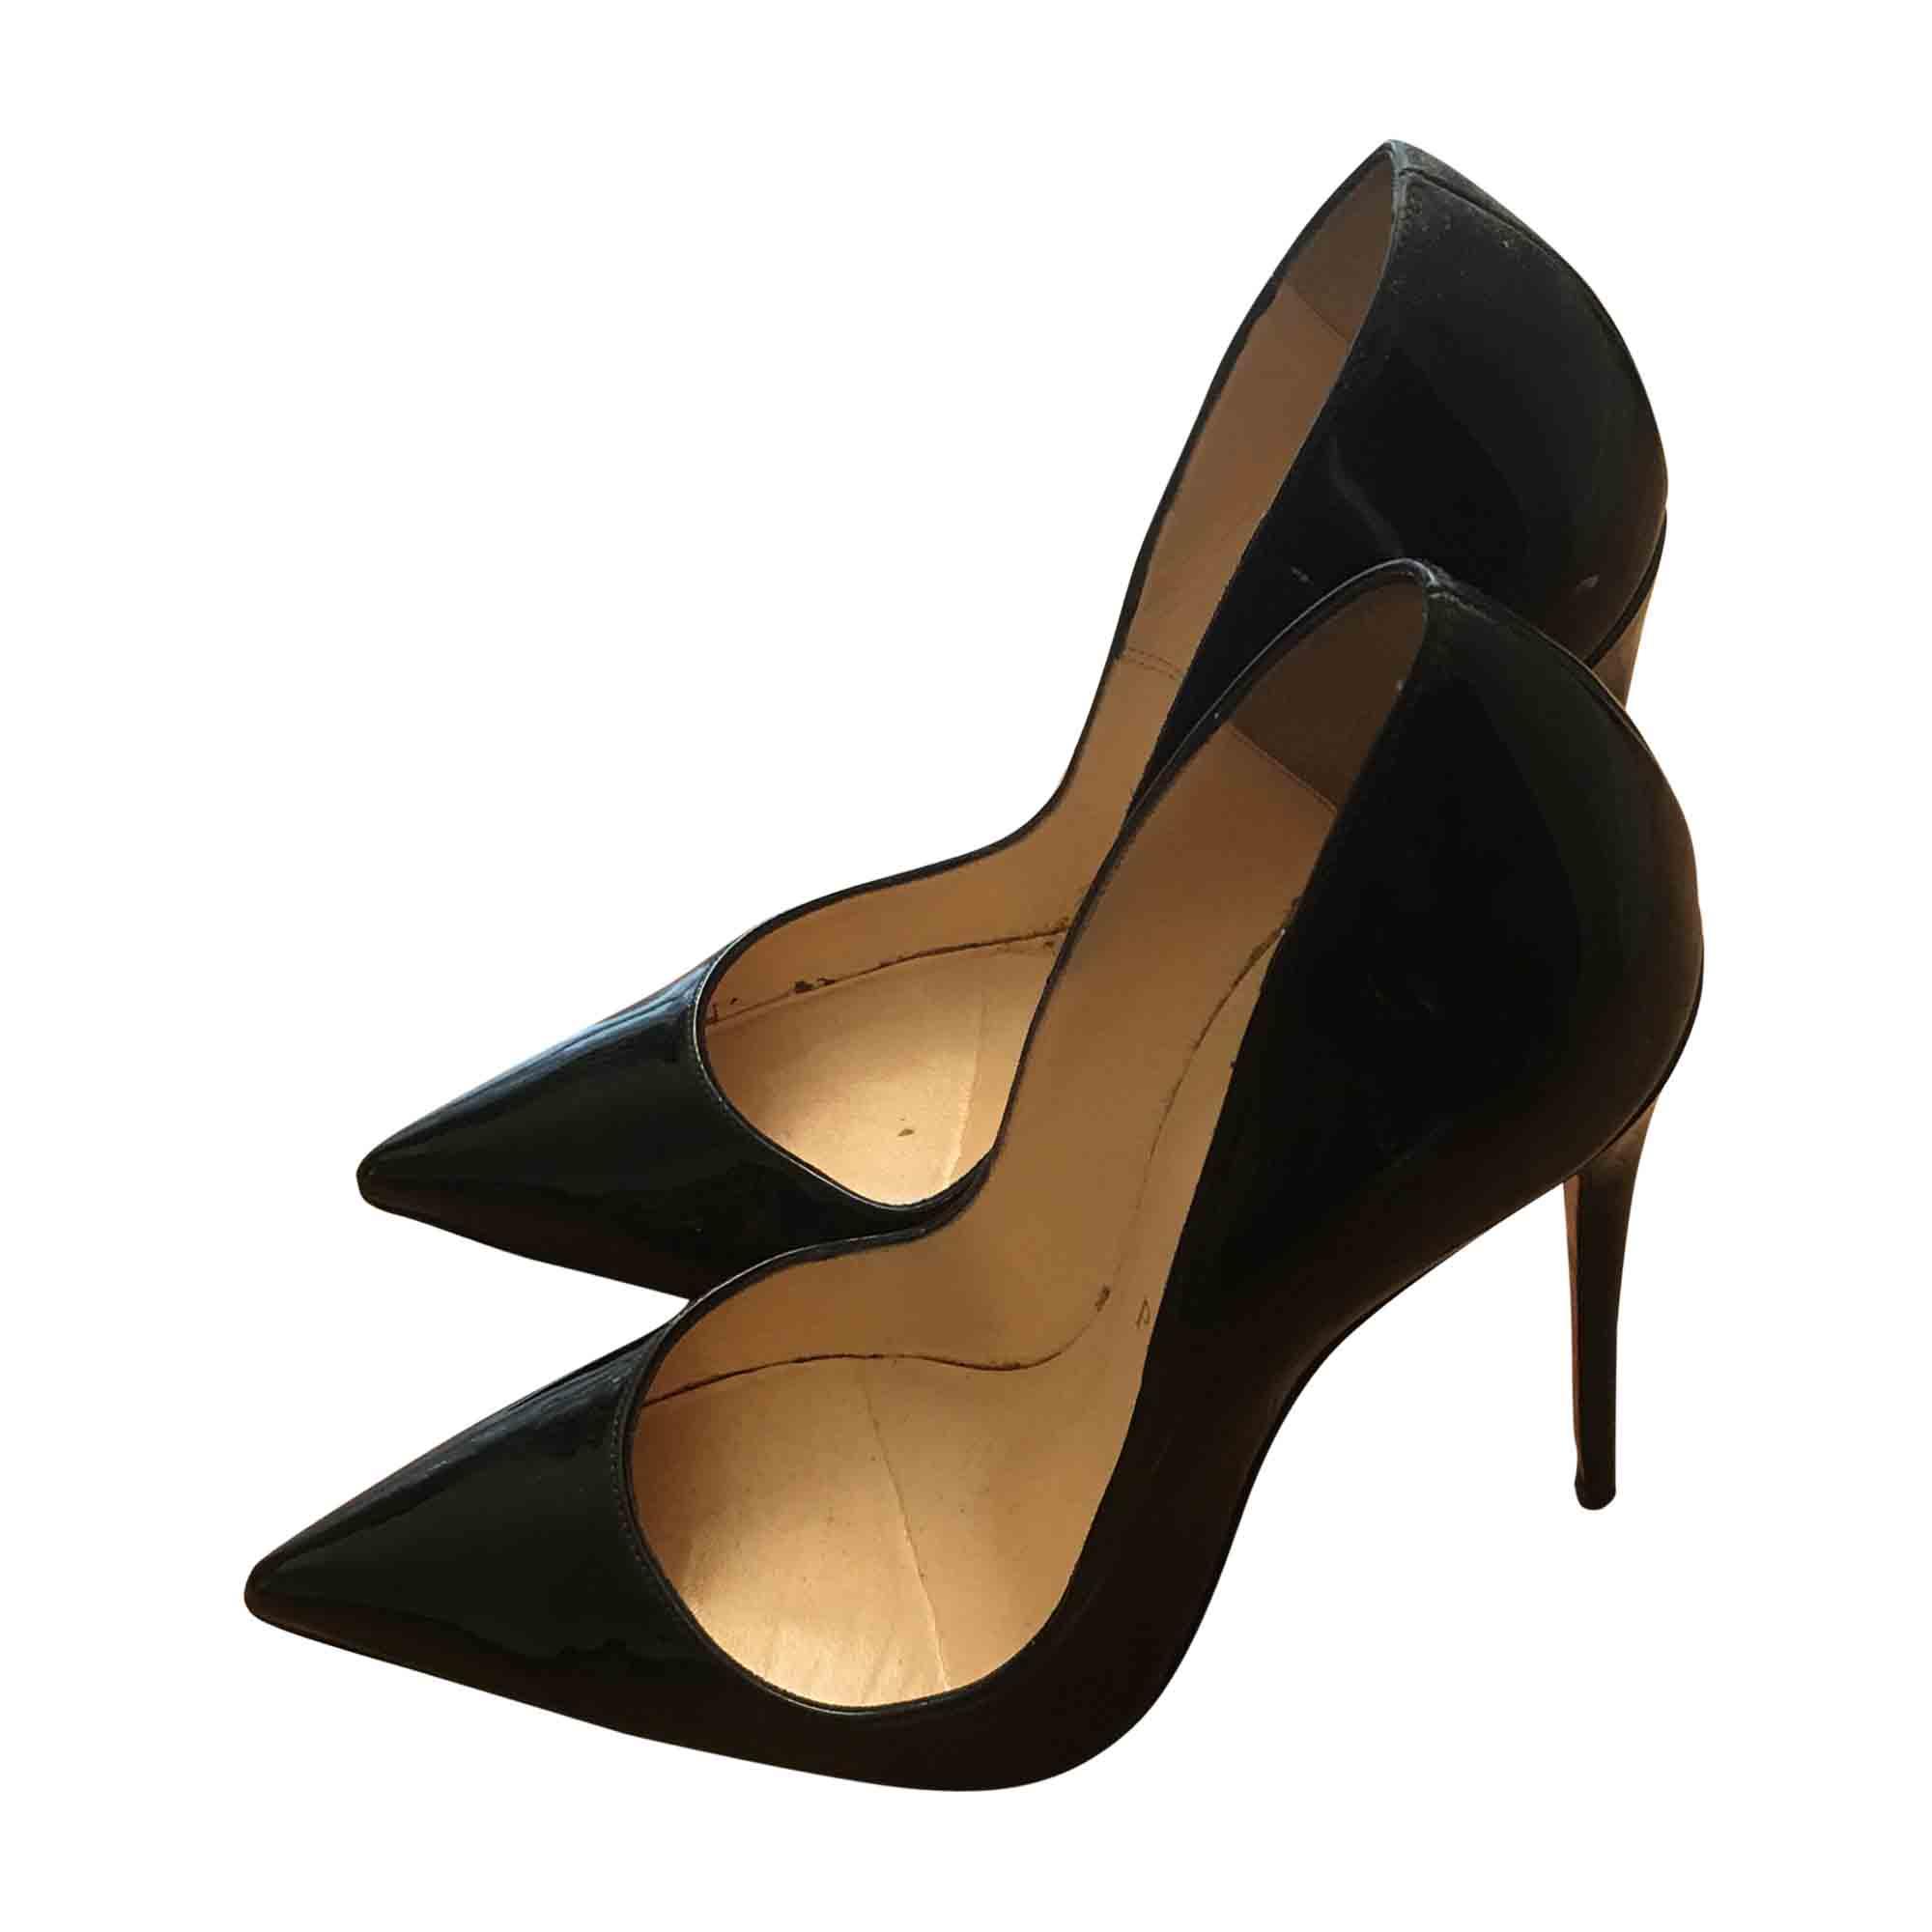 pas mal cdbf4 0e6f1 Chaussures de danse